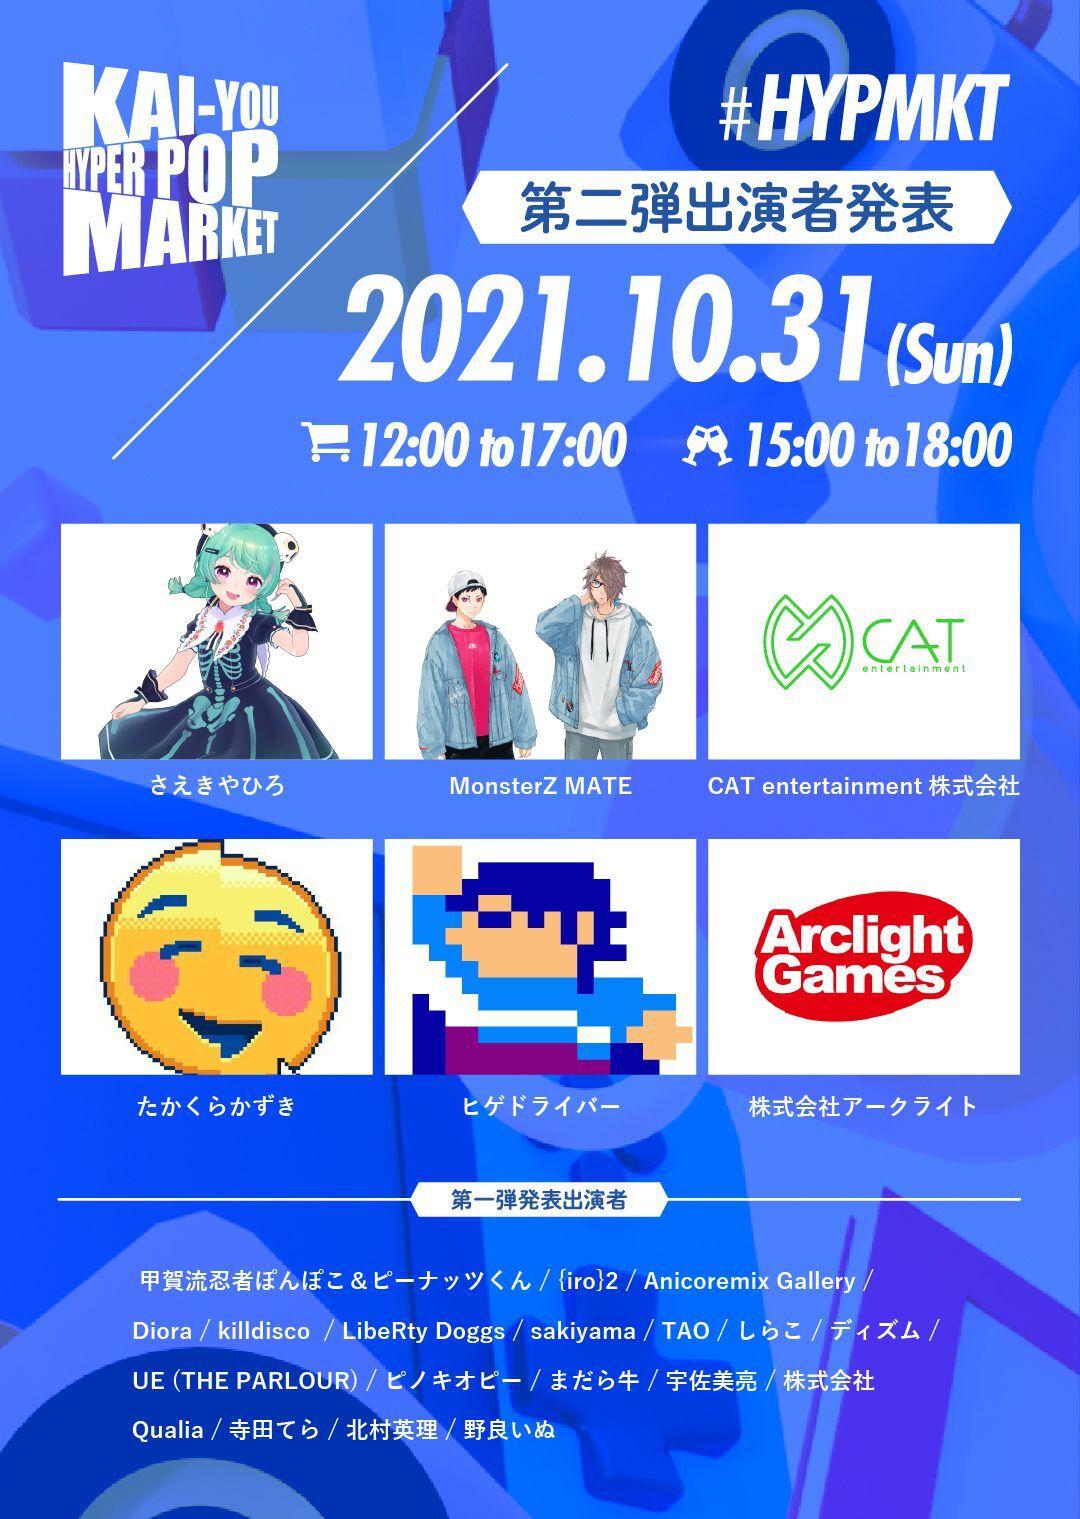 「KAI-YOU HYPER POP MARKET」第二弾出展者発表